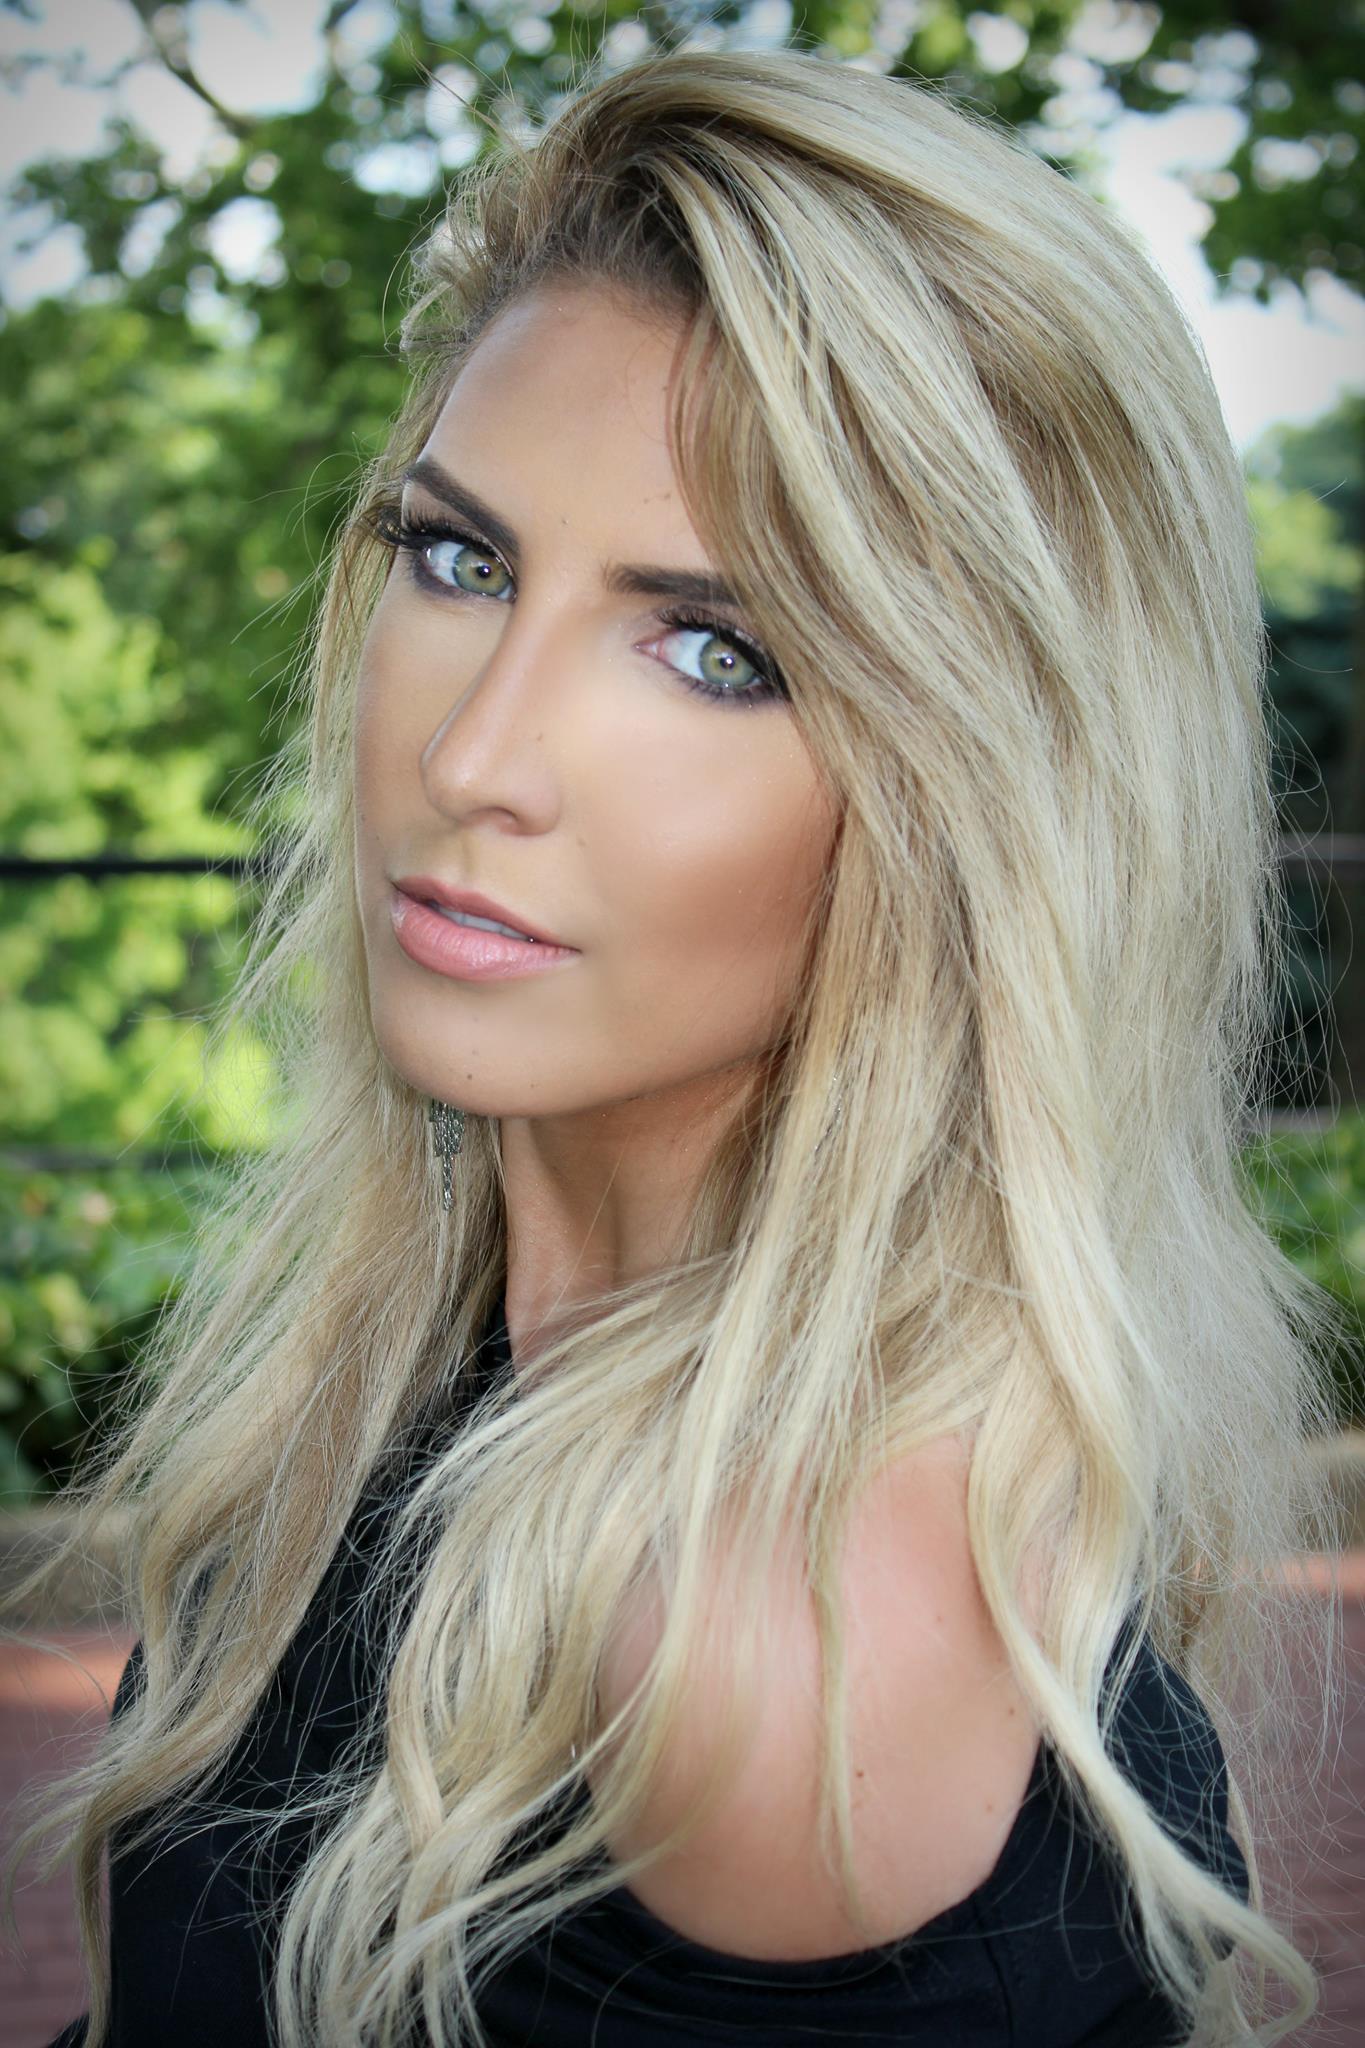 Heather Lee S Modeling Portfolio Heather Lee O Keefe